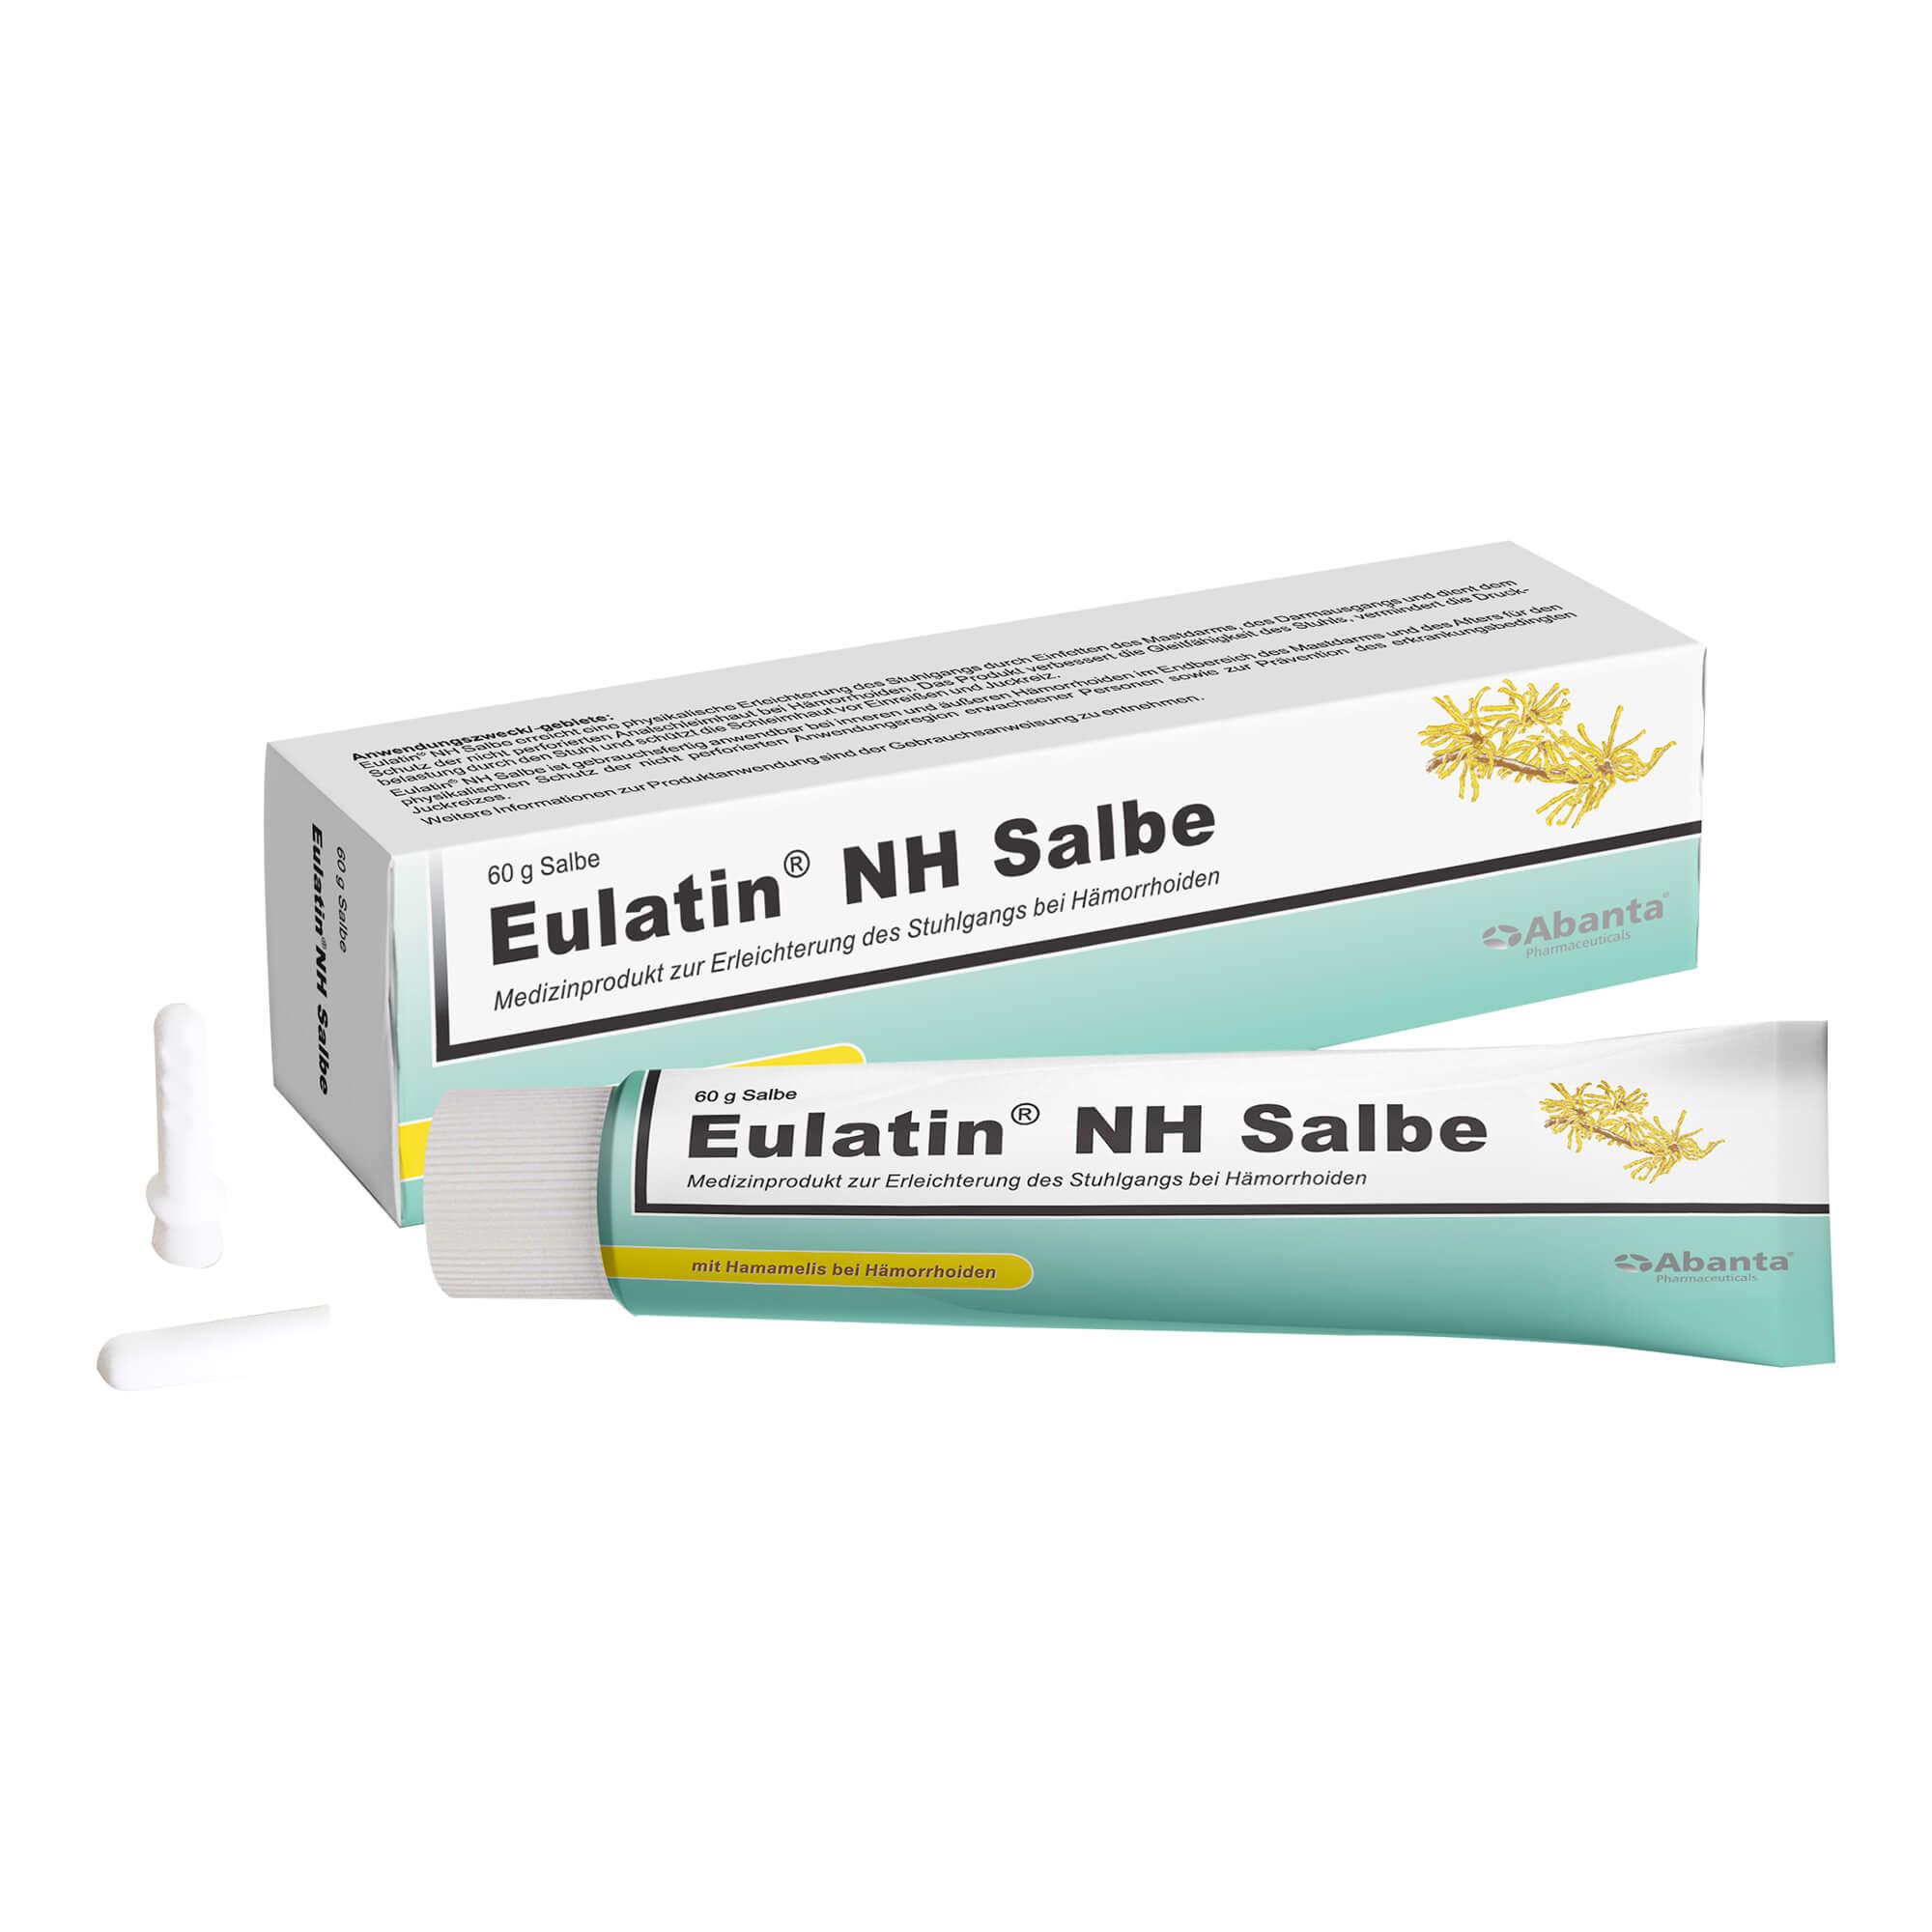 Eulatin Salbe